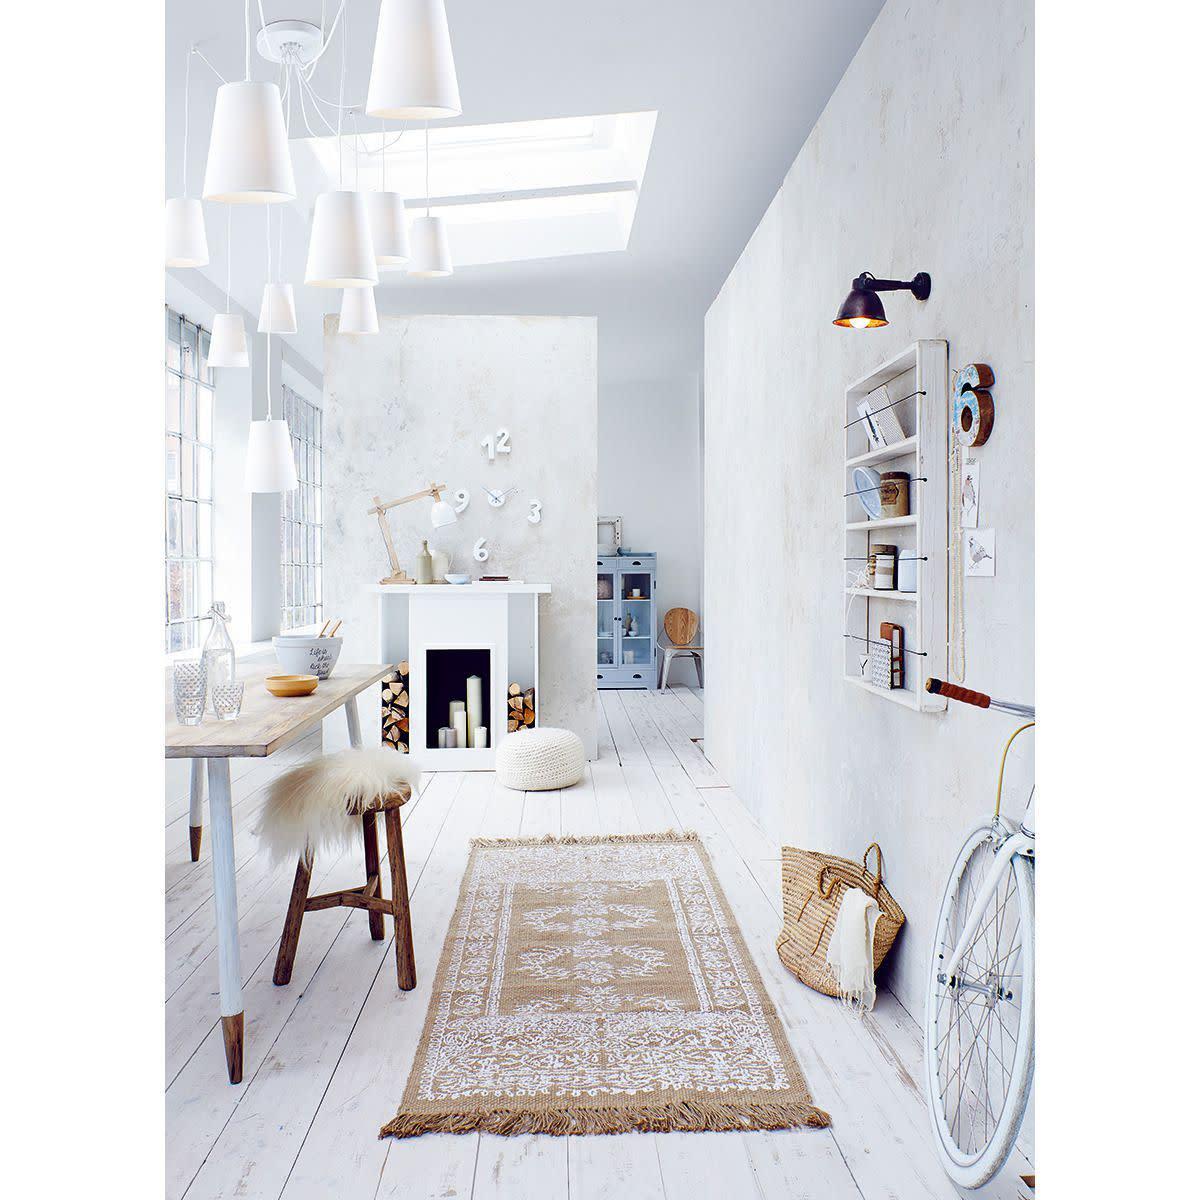 Teppich, Ornamente, Jute (Impressionen)